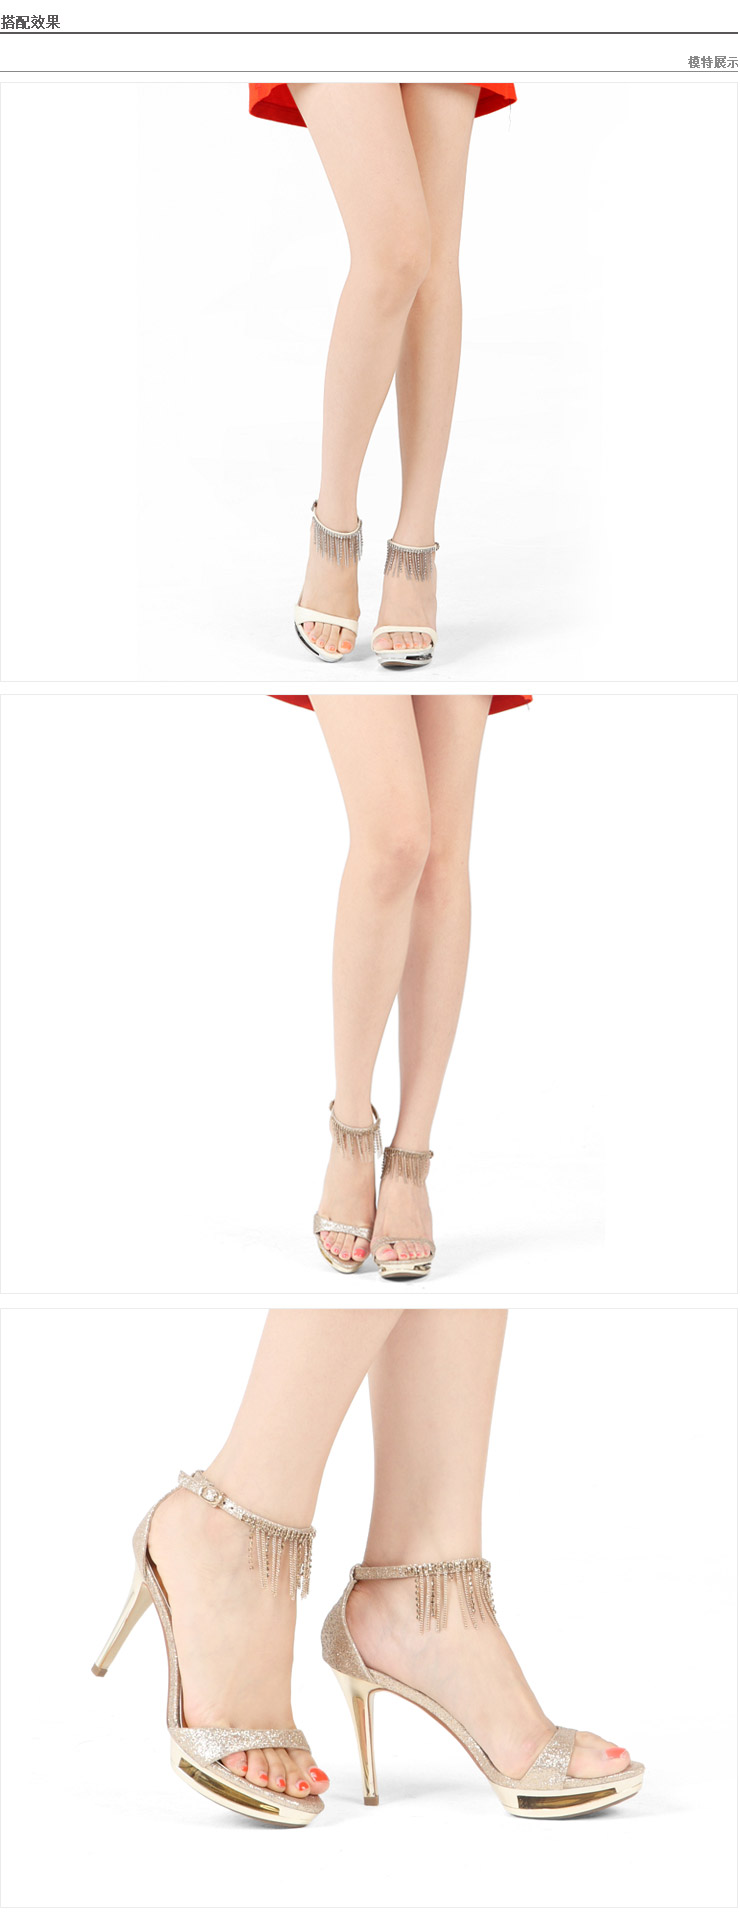 tata/他她2012夏季白色亮片布闪亮奢华女凉鞋fxr40